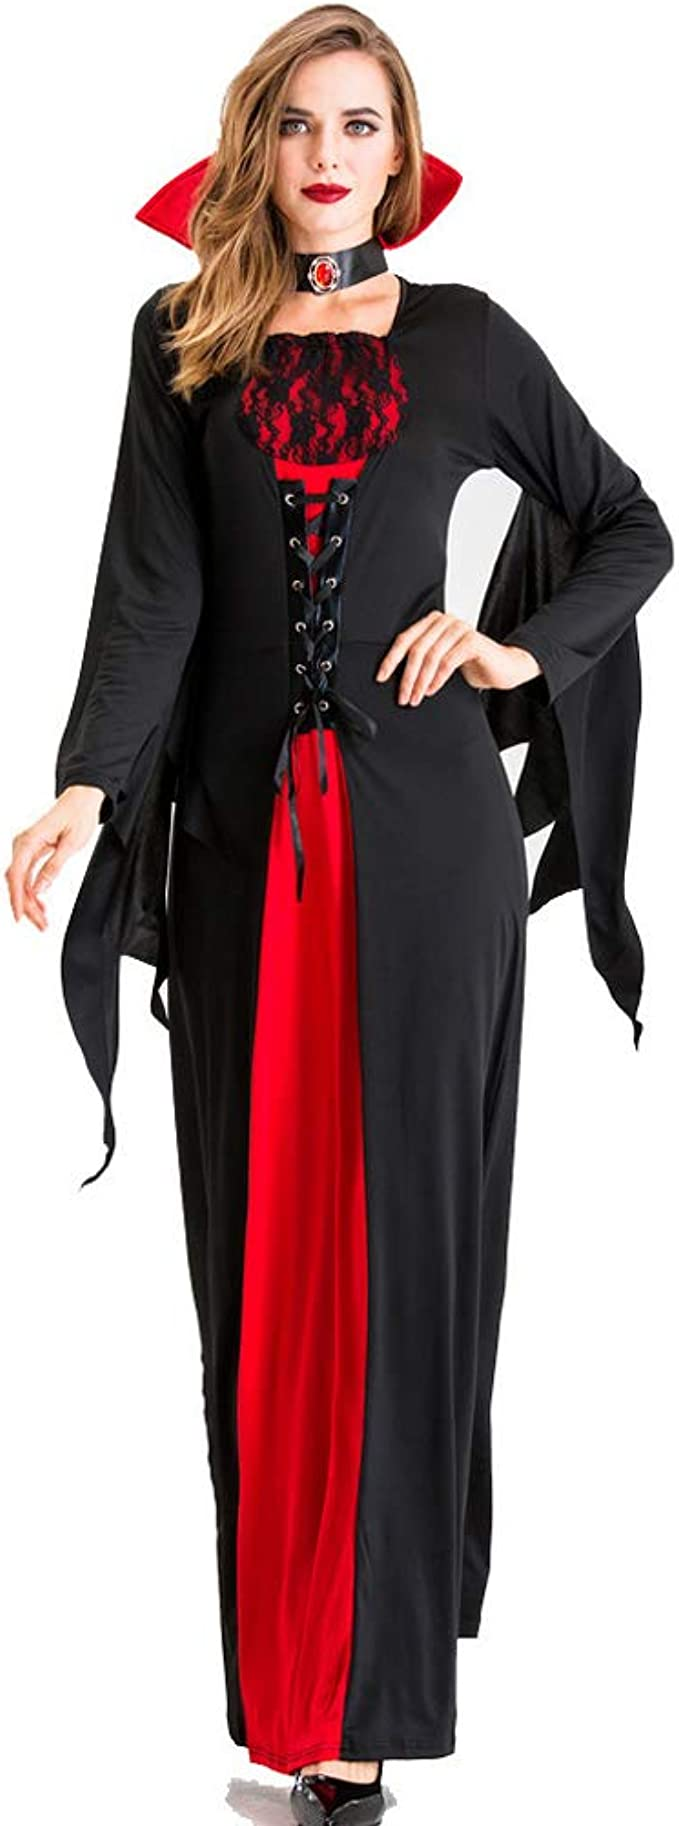 LISM Disfraz de Halloween para Mujer Vampiresa Vestir Mal Bruja ...